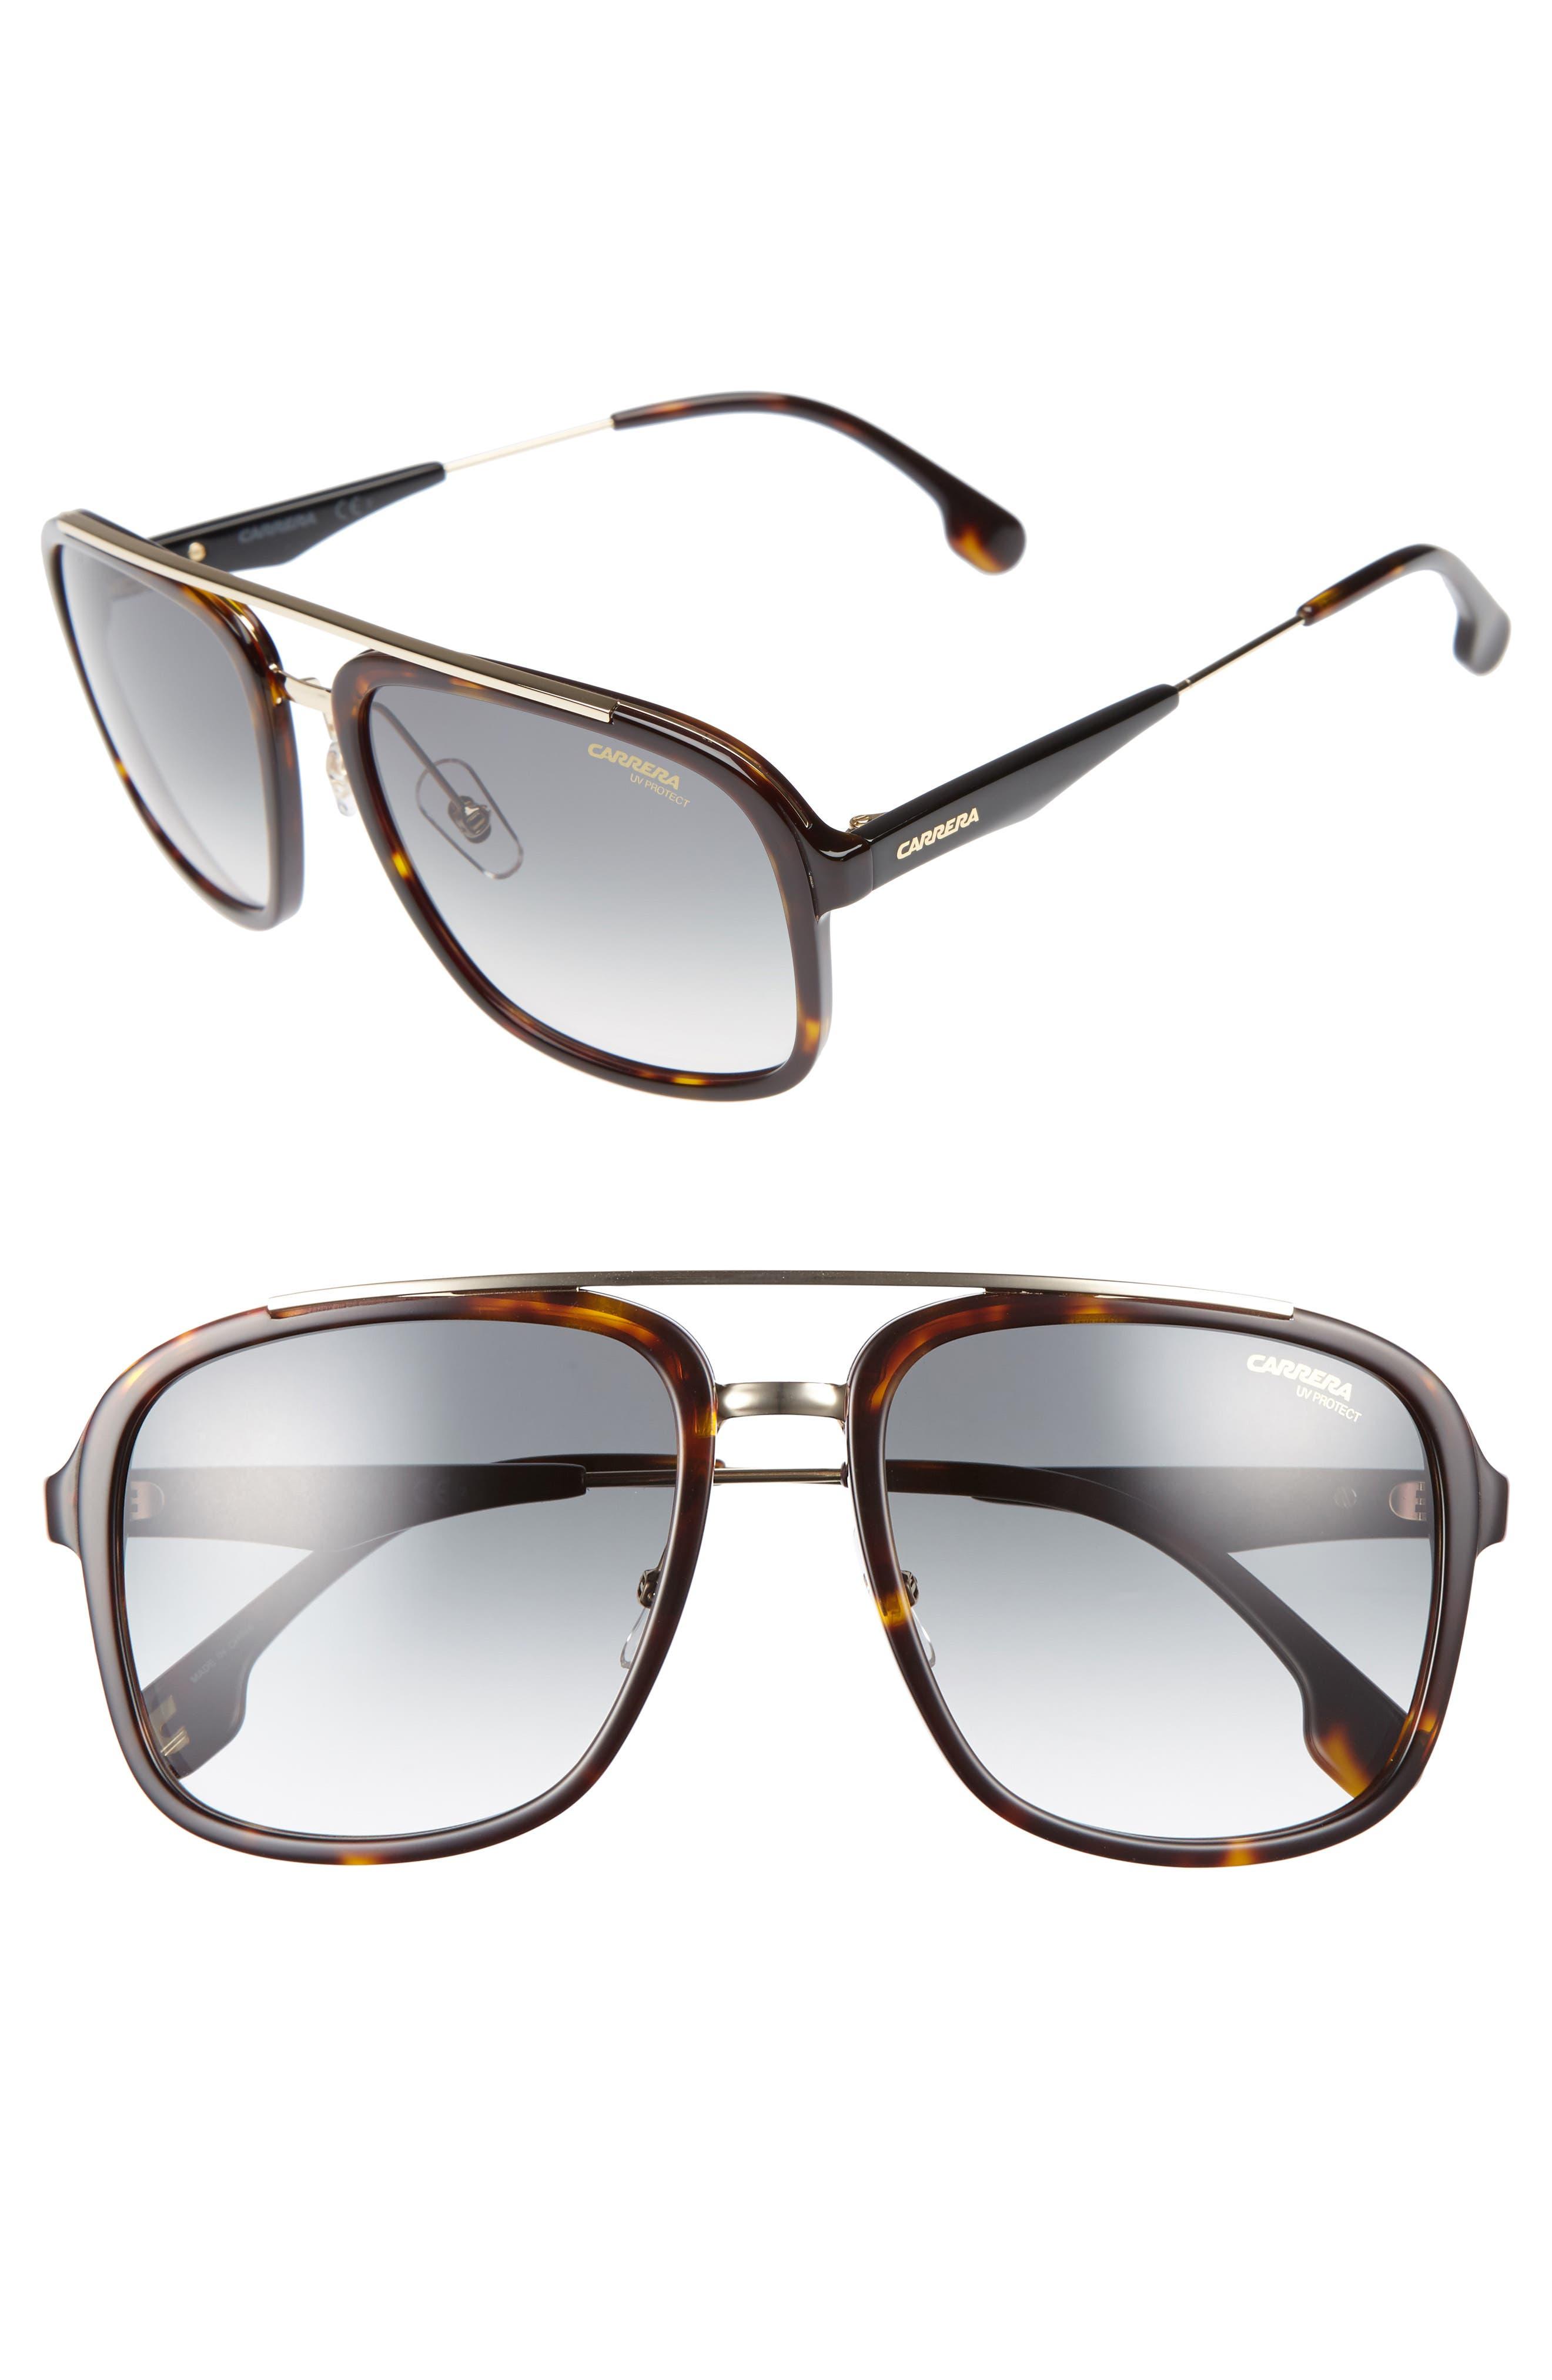 Carrera Eyewear 57Mm Sunglasses - Havana Gold